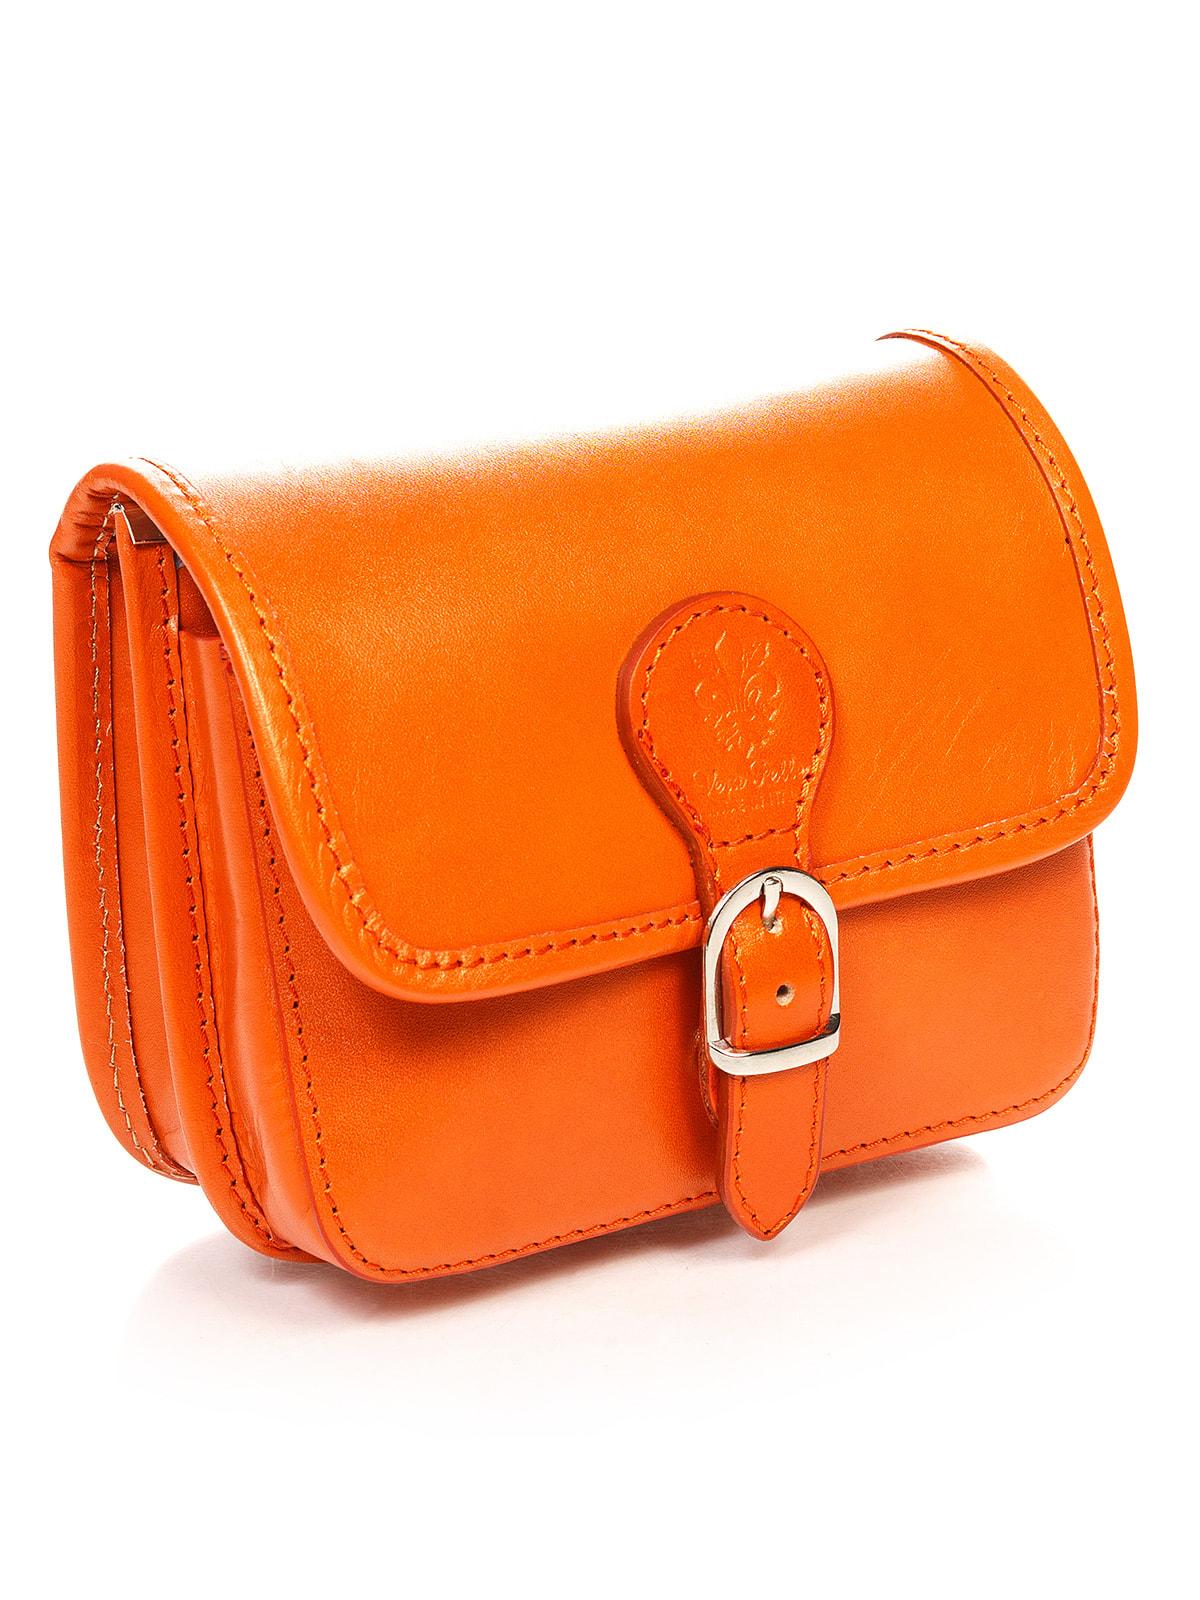 Сумка оранжевая | 4654275 | фото 3